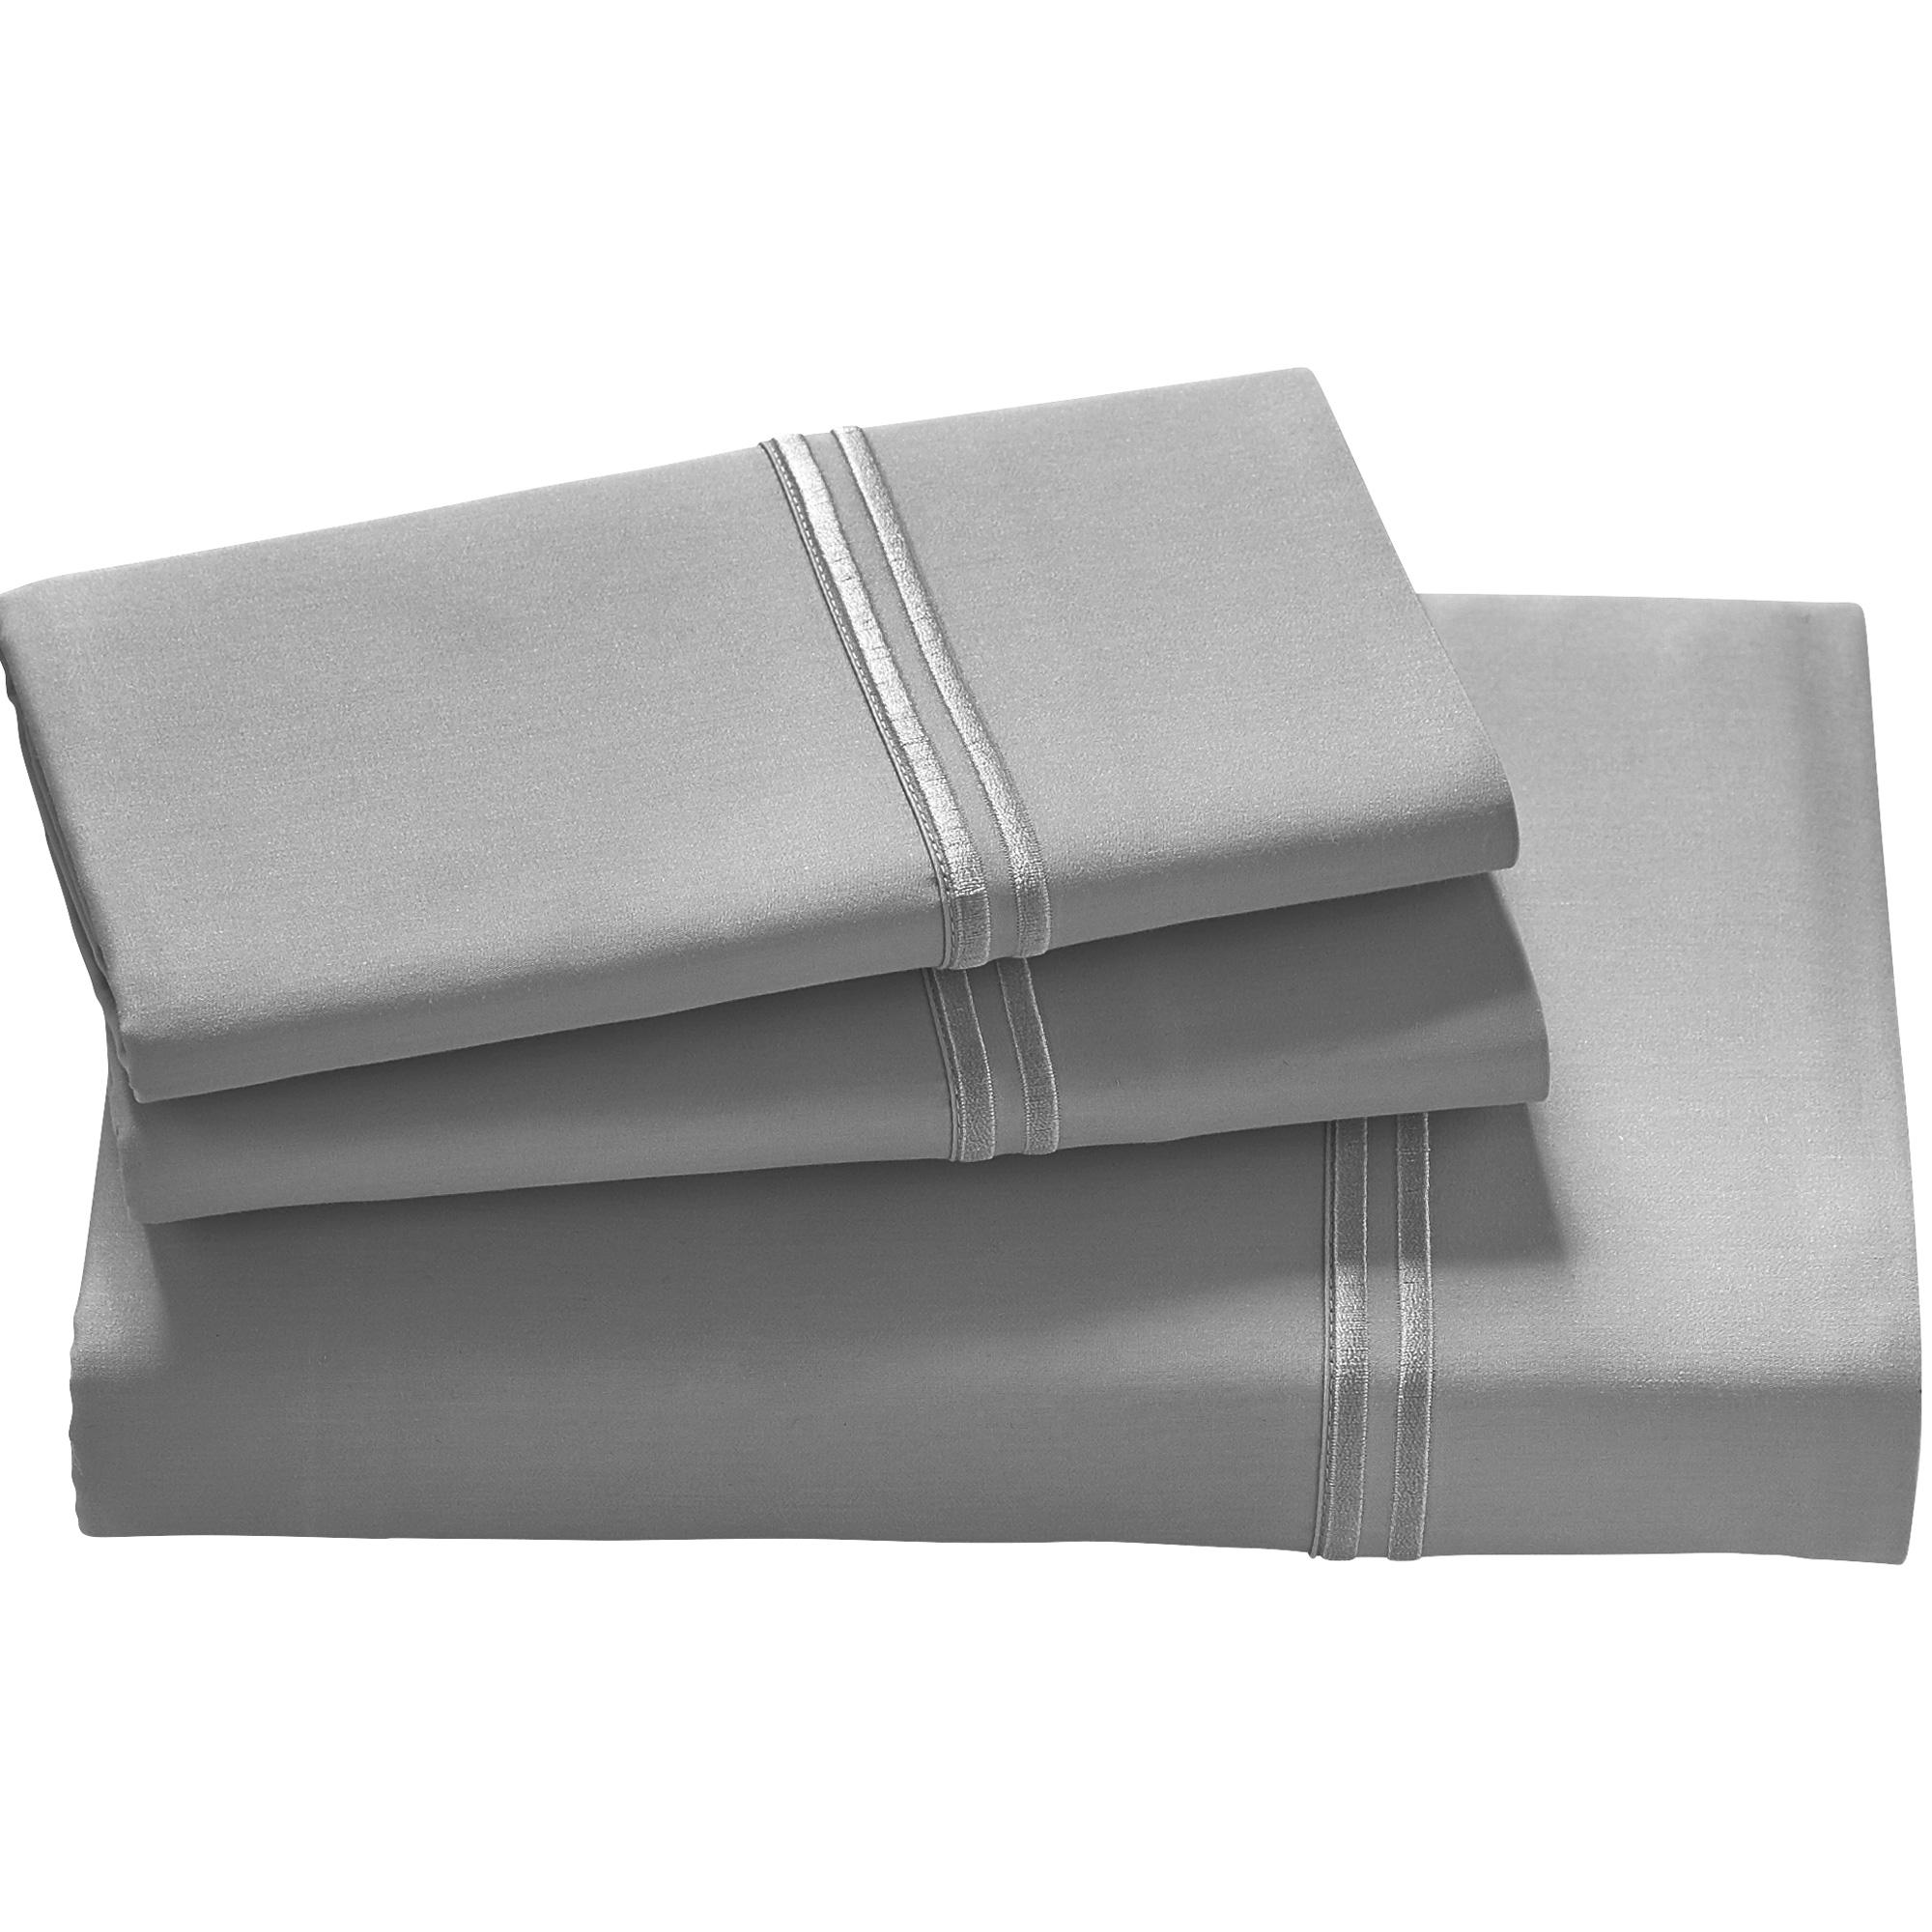 Purecare | Elements Dove Gray Twin XL Modal Sheet Set